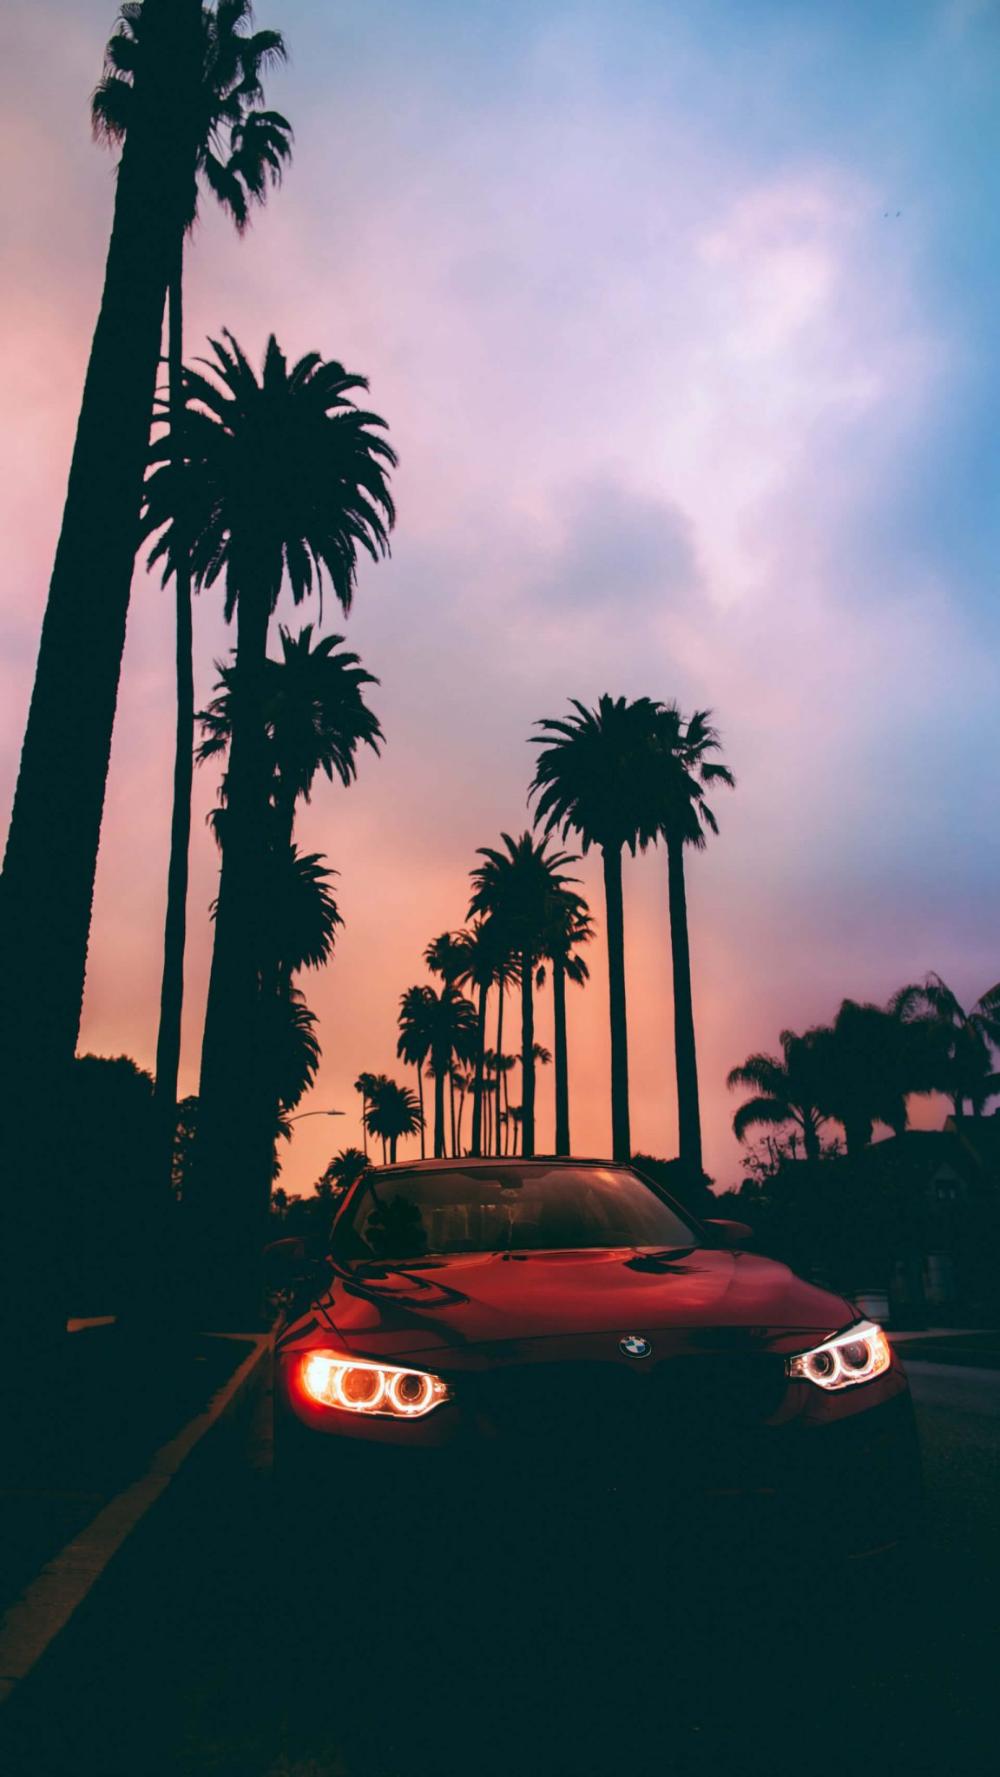 999+ 4K HD iPhone Lockscreen Background Wallpaper